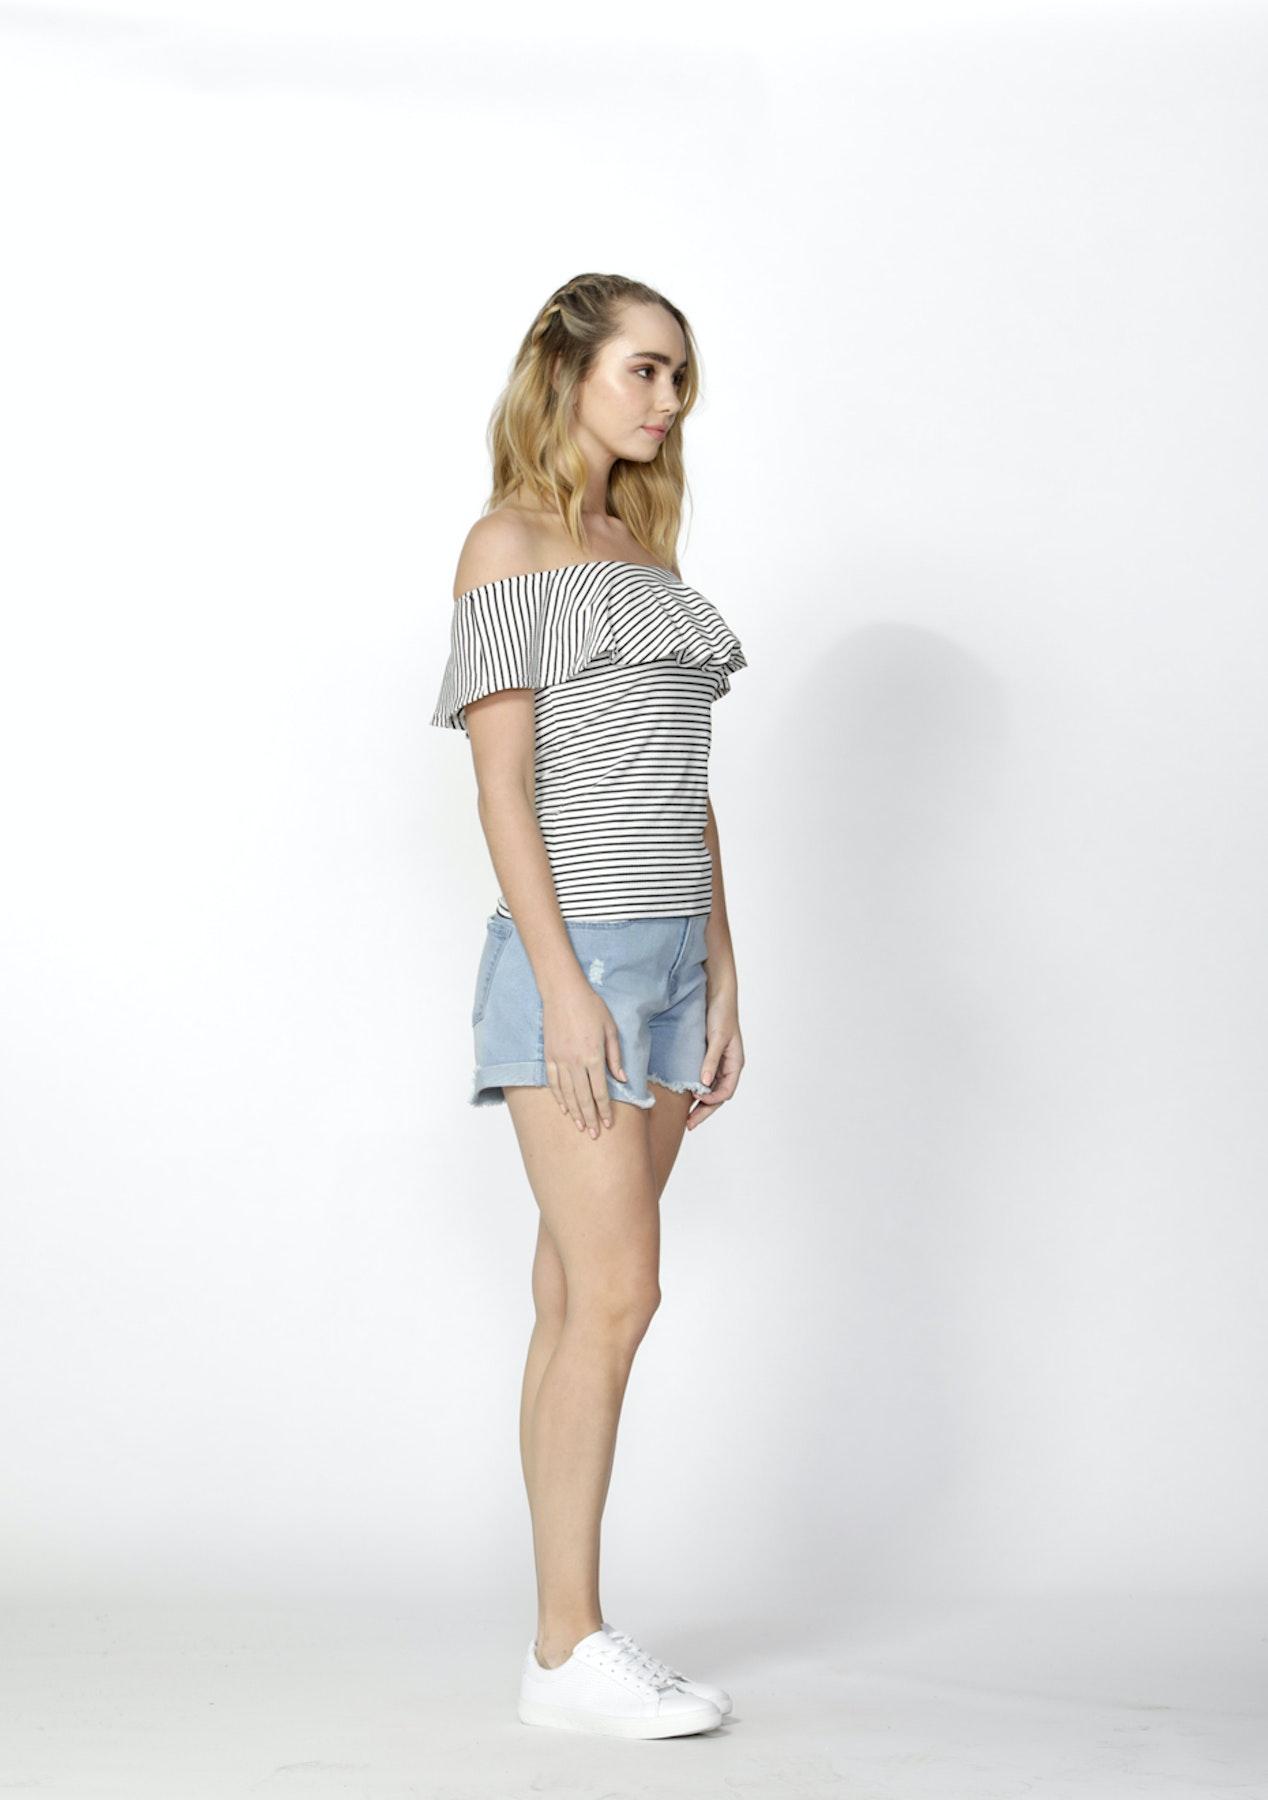 Sass - Ciara Ruffle Overlay Knit Top - Black White Stripe - Betty Basics    Sass   Fate Bonanza - Onceit cfe63f93a